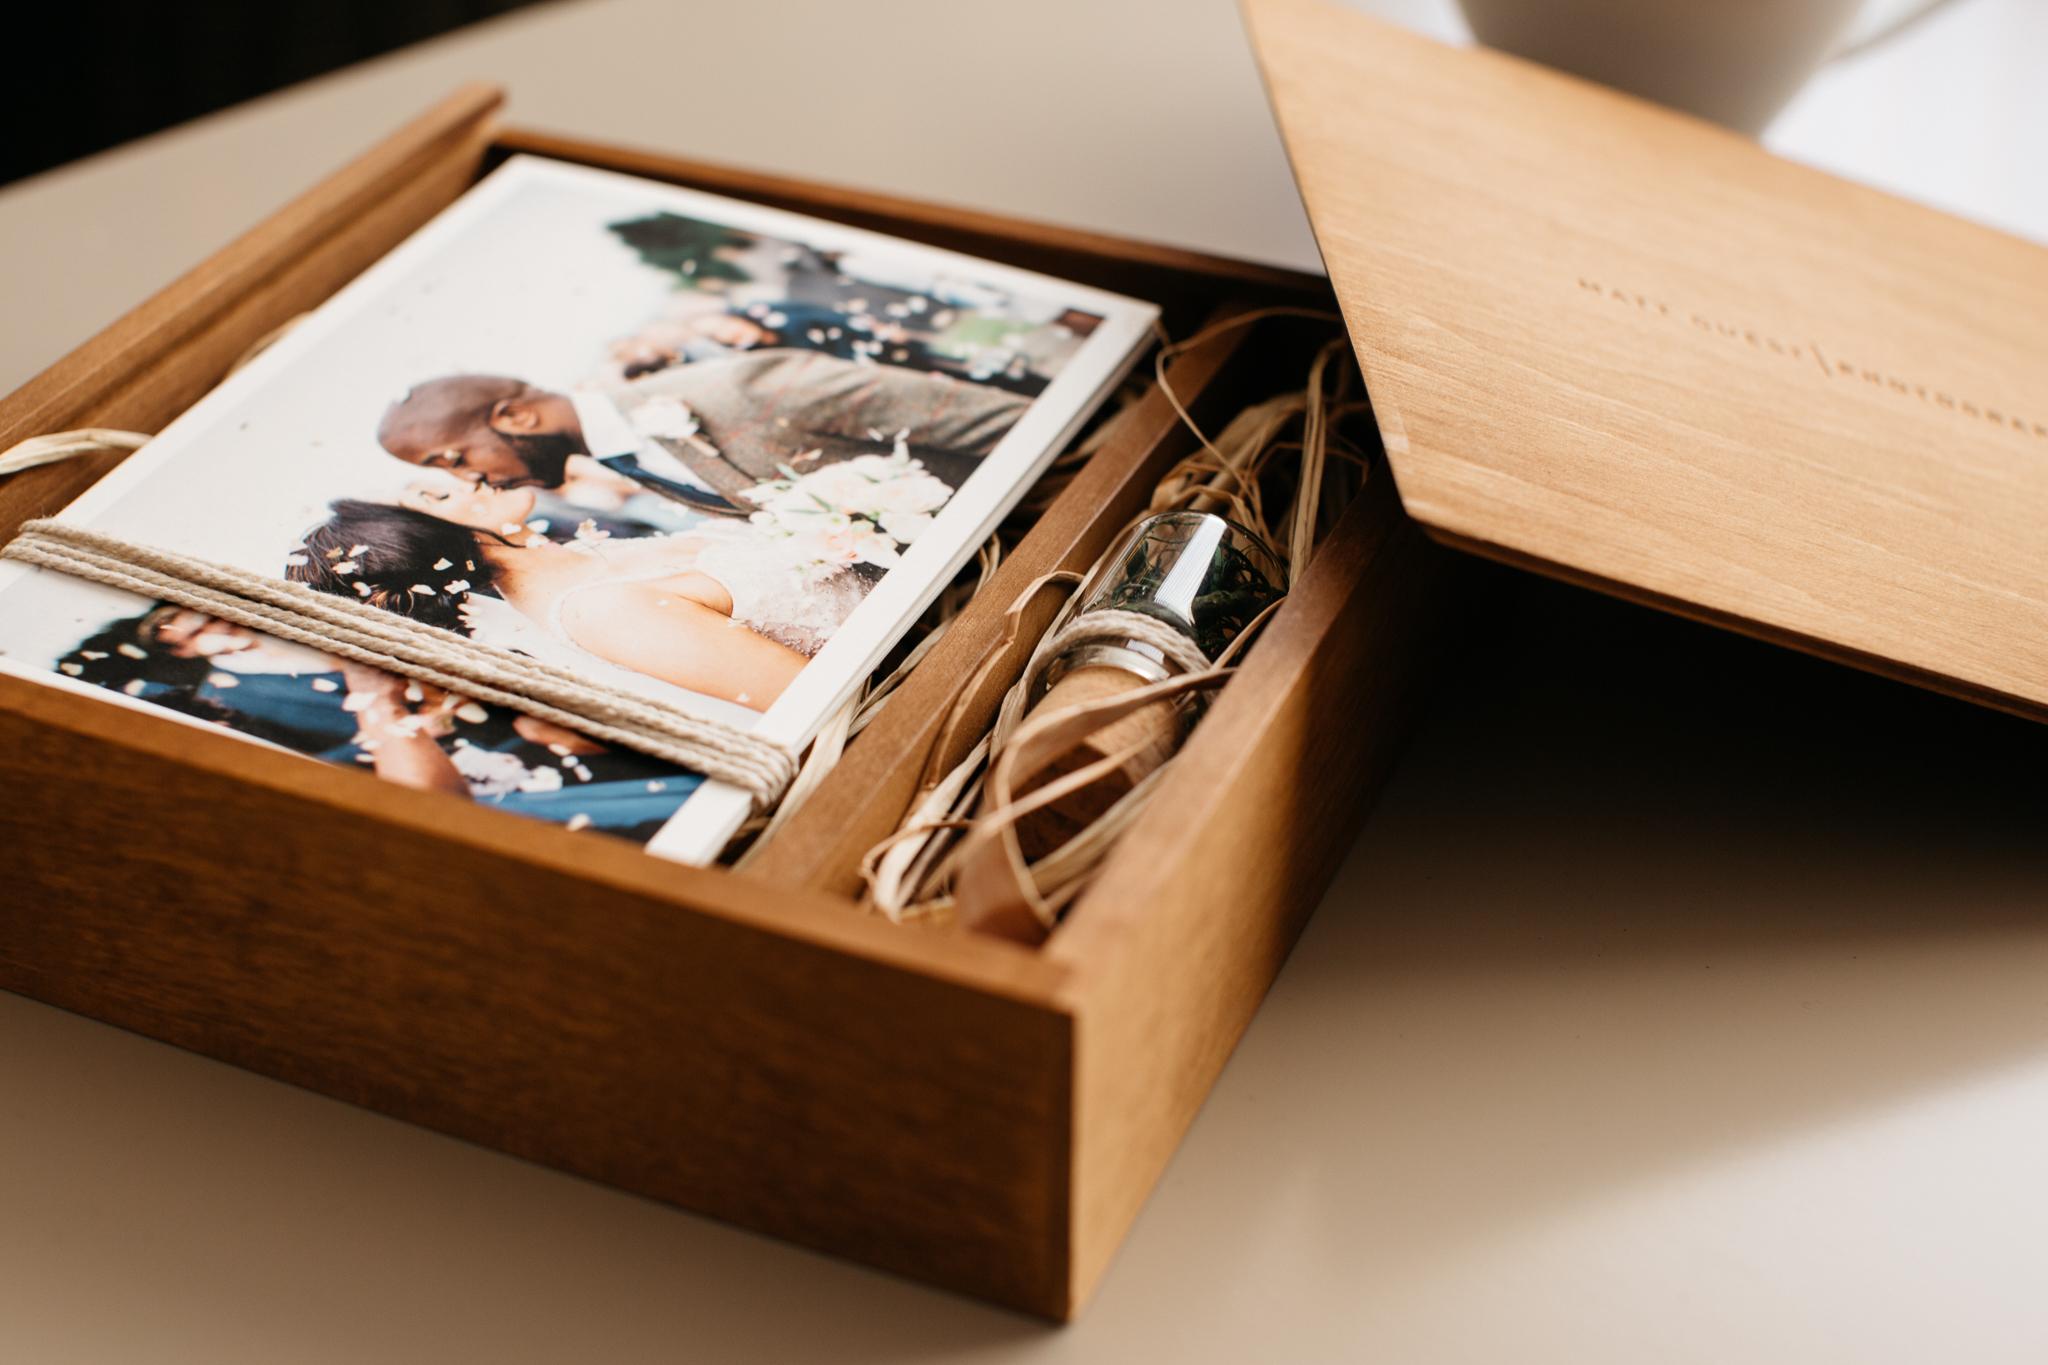 USB Presentation Box